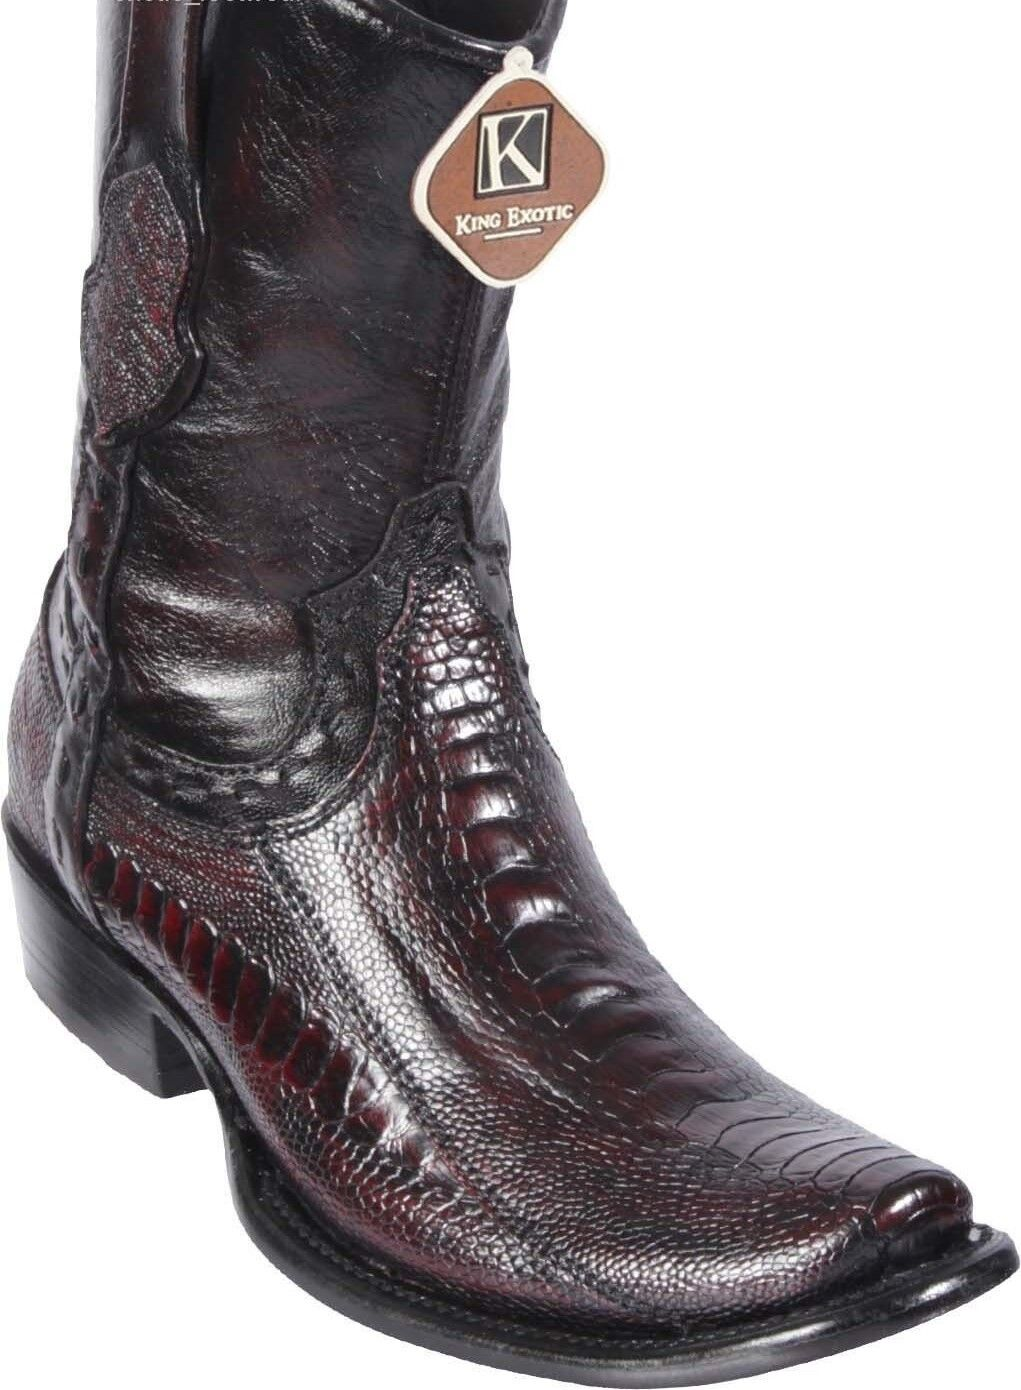 King Exotic CHERRY OSTRICH LEG Western Boot Side Zipper Mid Calf EE